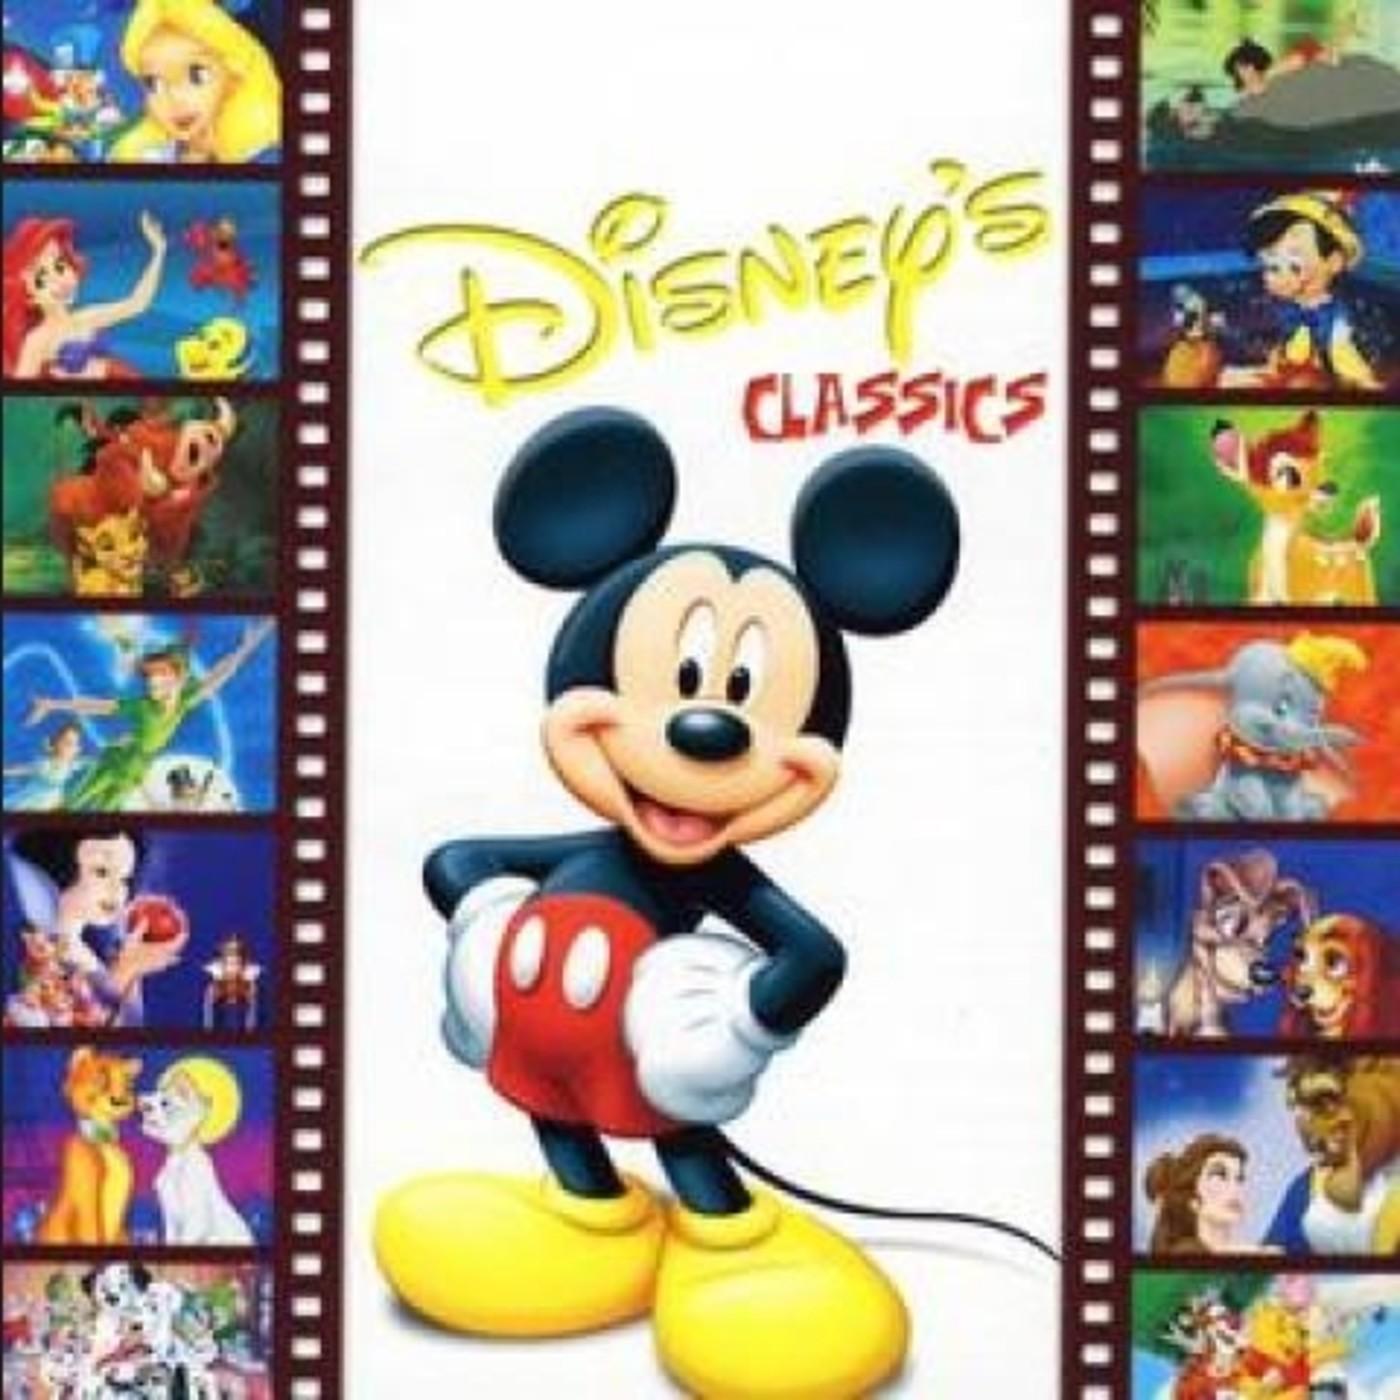 Cuentos Disney - Peter Pan